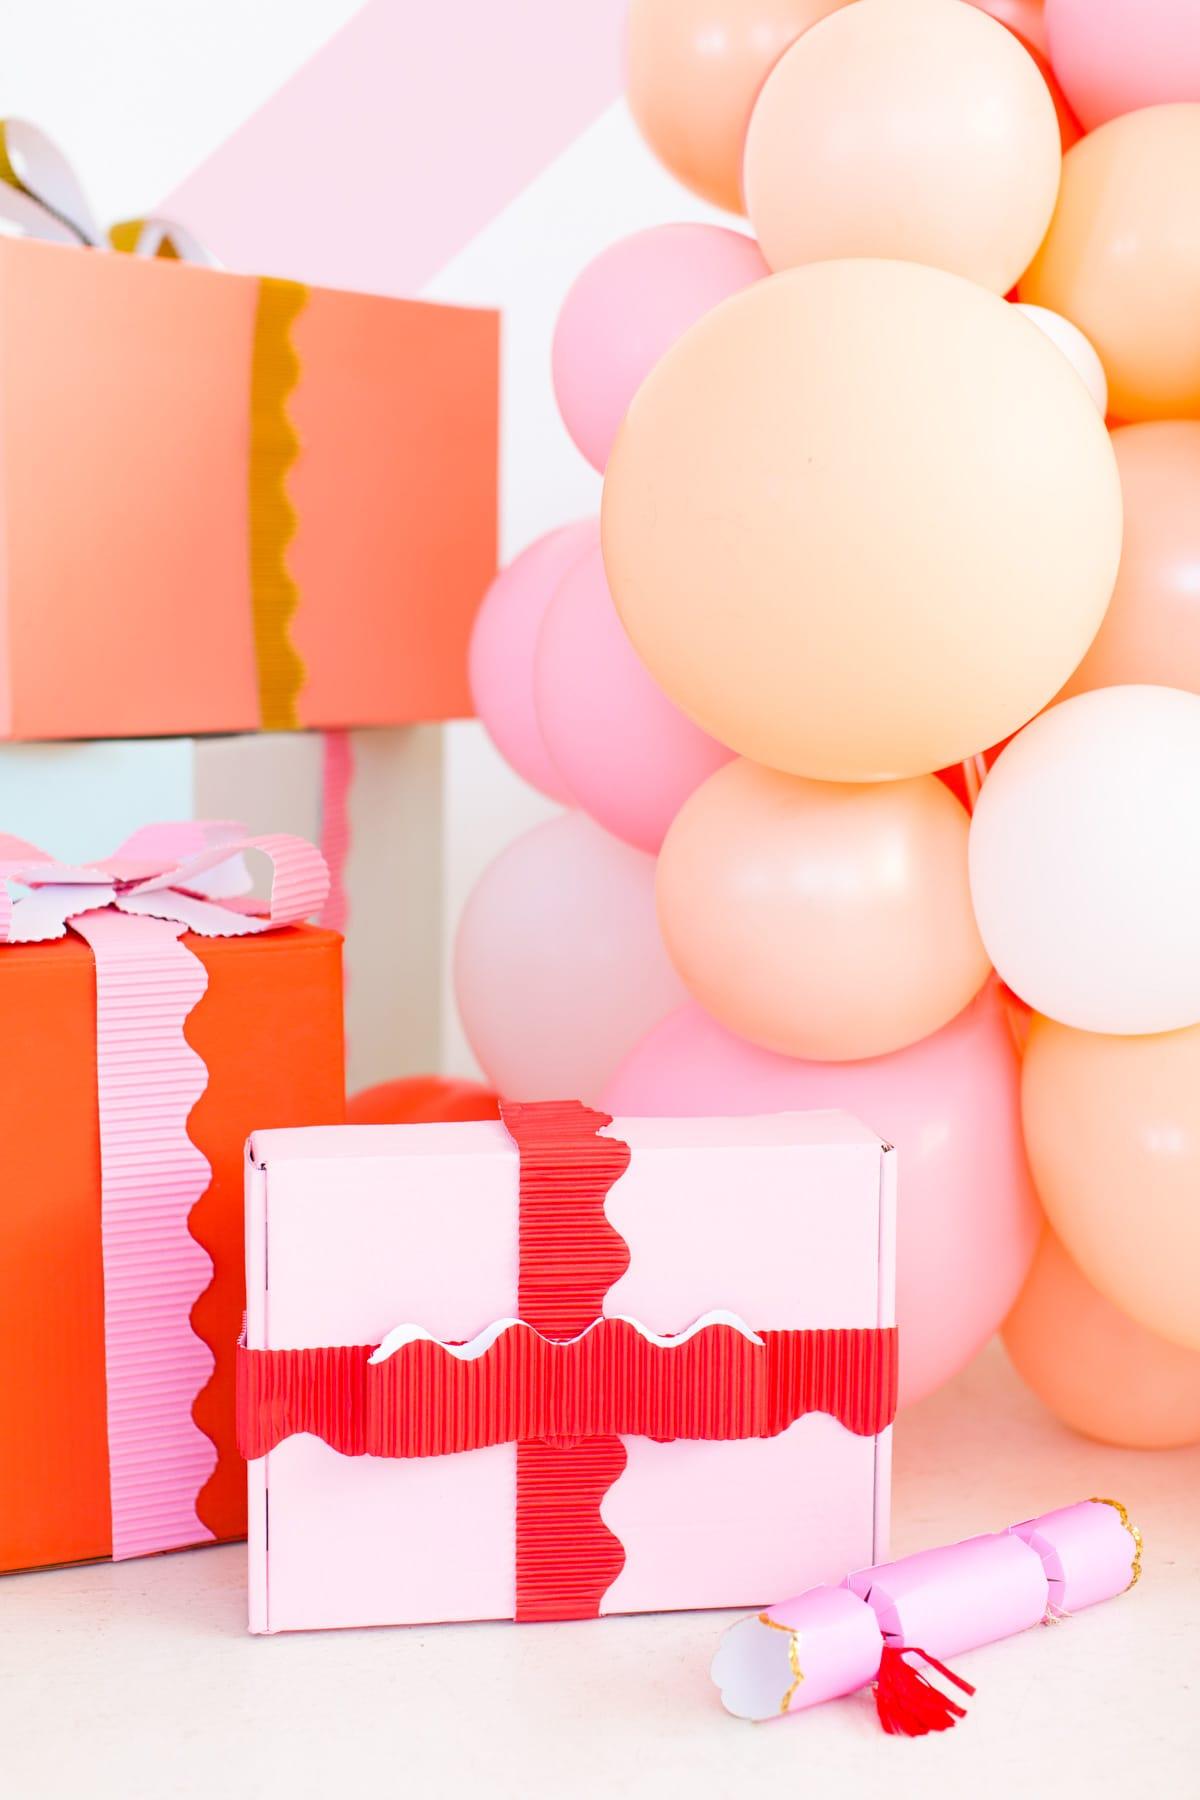 coloridas ideas para hacer decoración navideña DIY, fotos de manualidades para navidad, decoracion con globos paso a paso